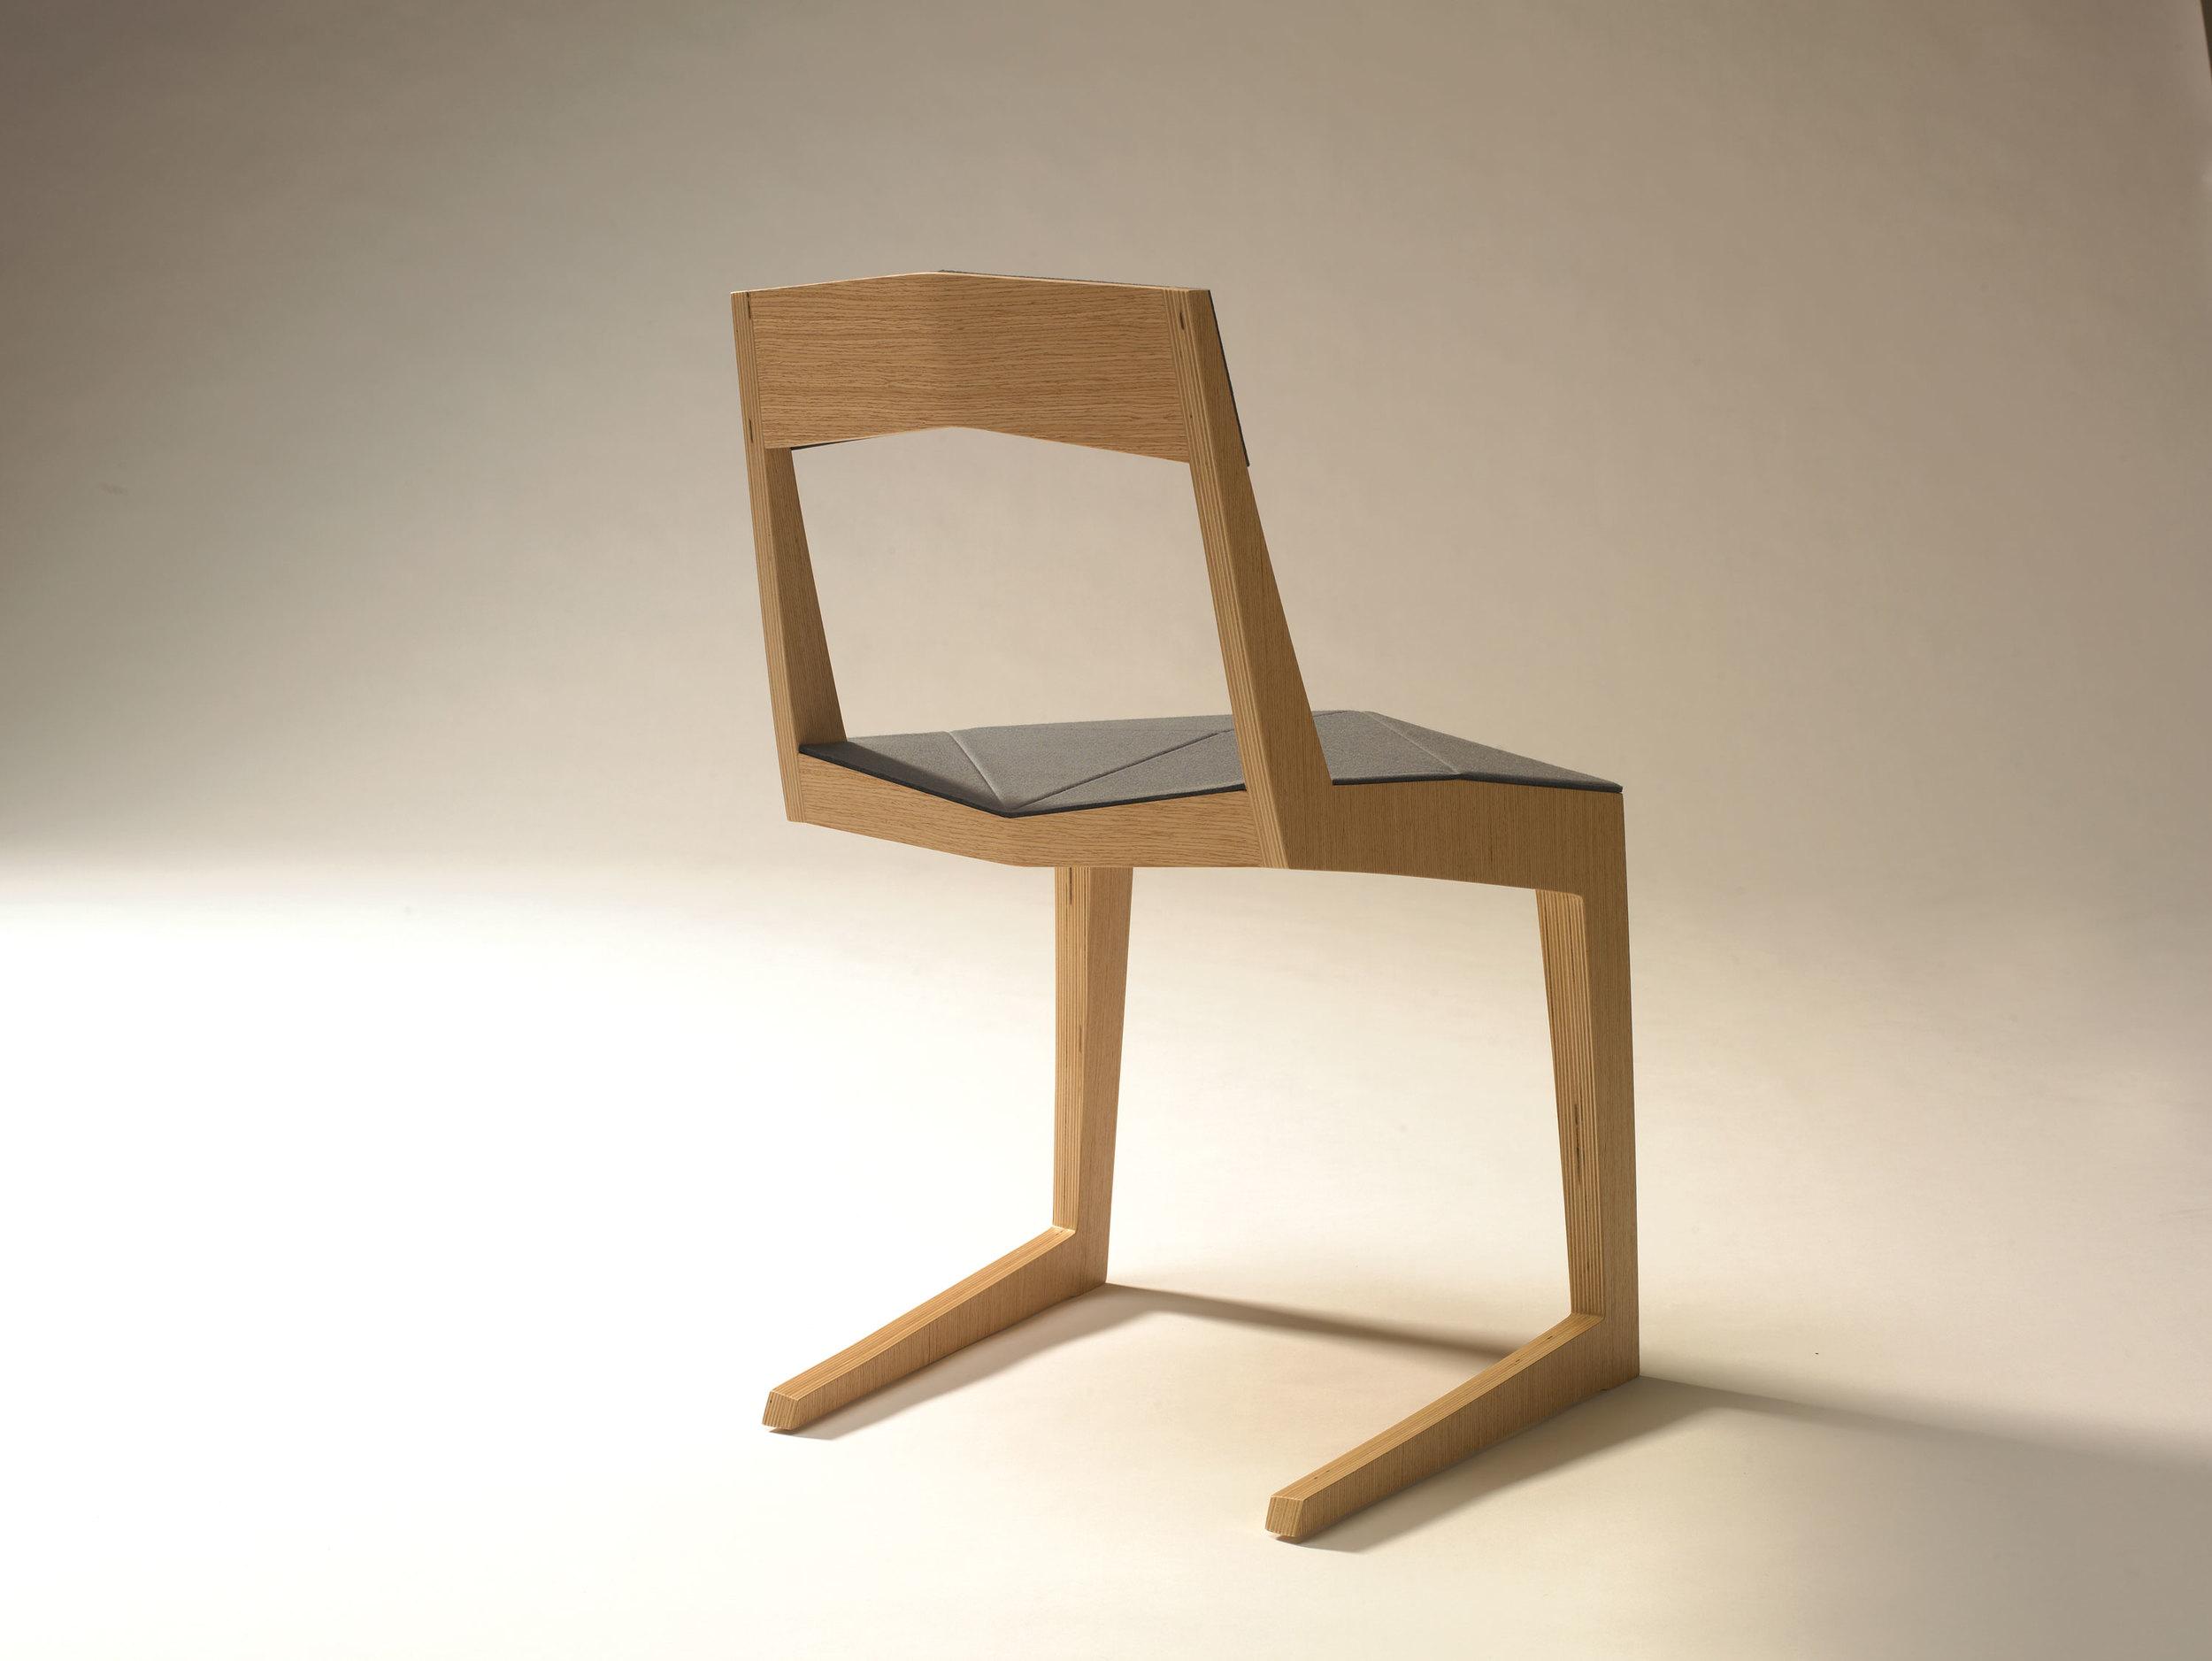 SD_chair-back-view.jpg